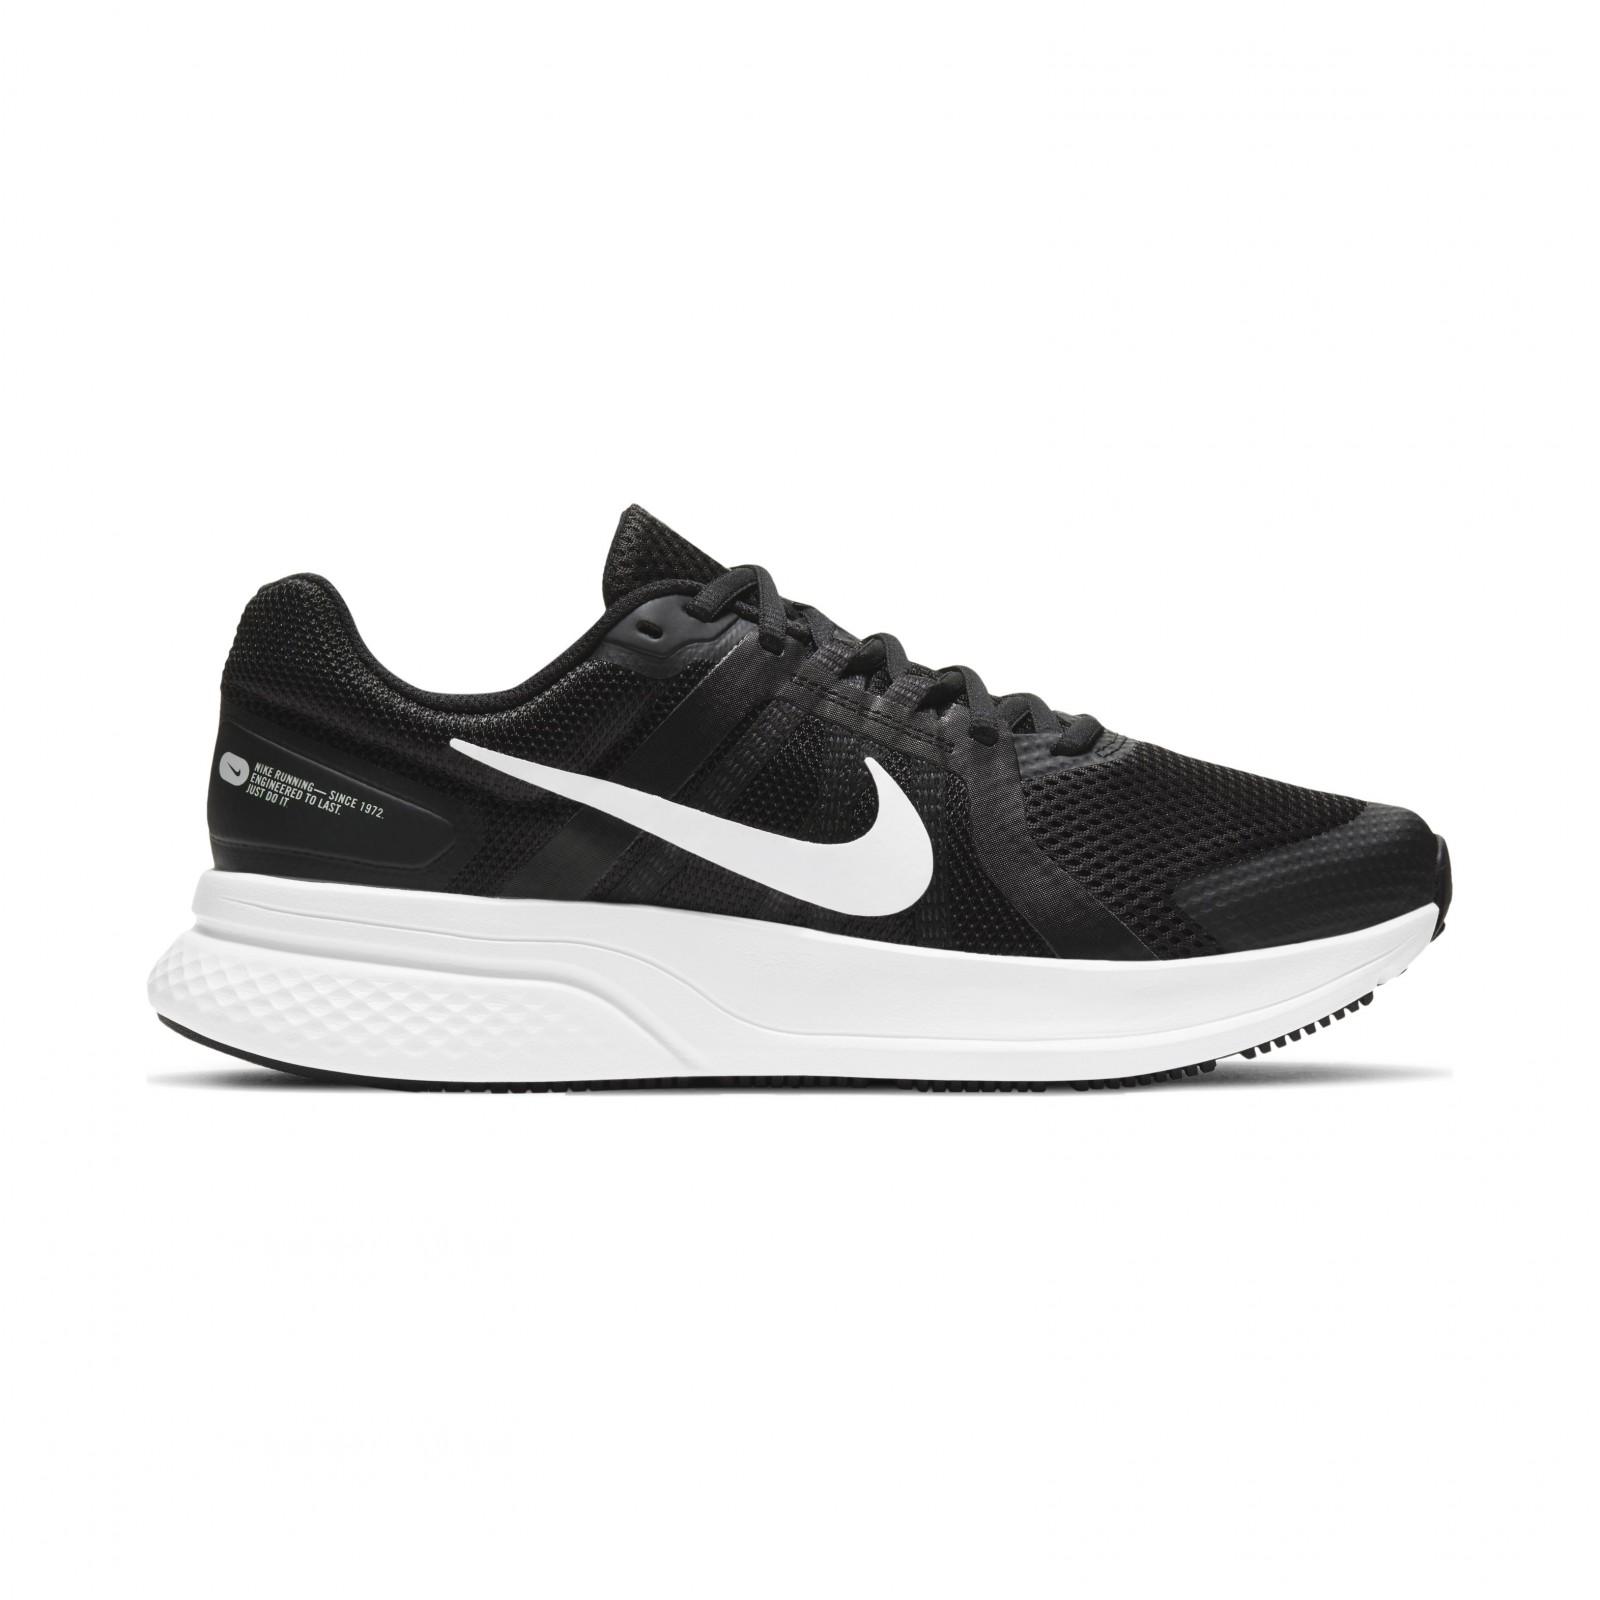 Nike run swift 2 black/white